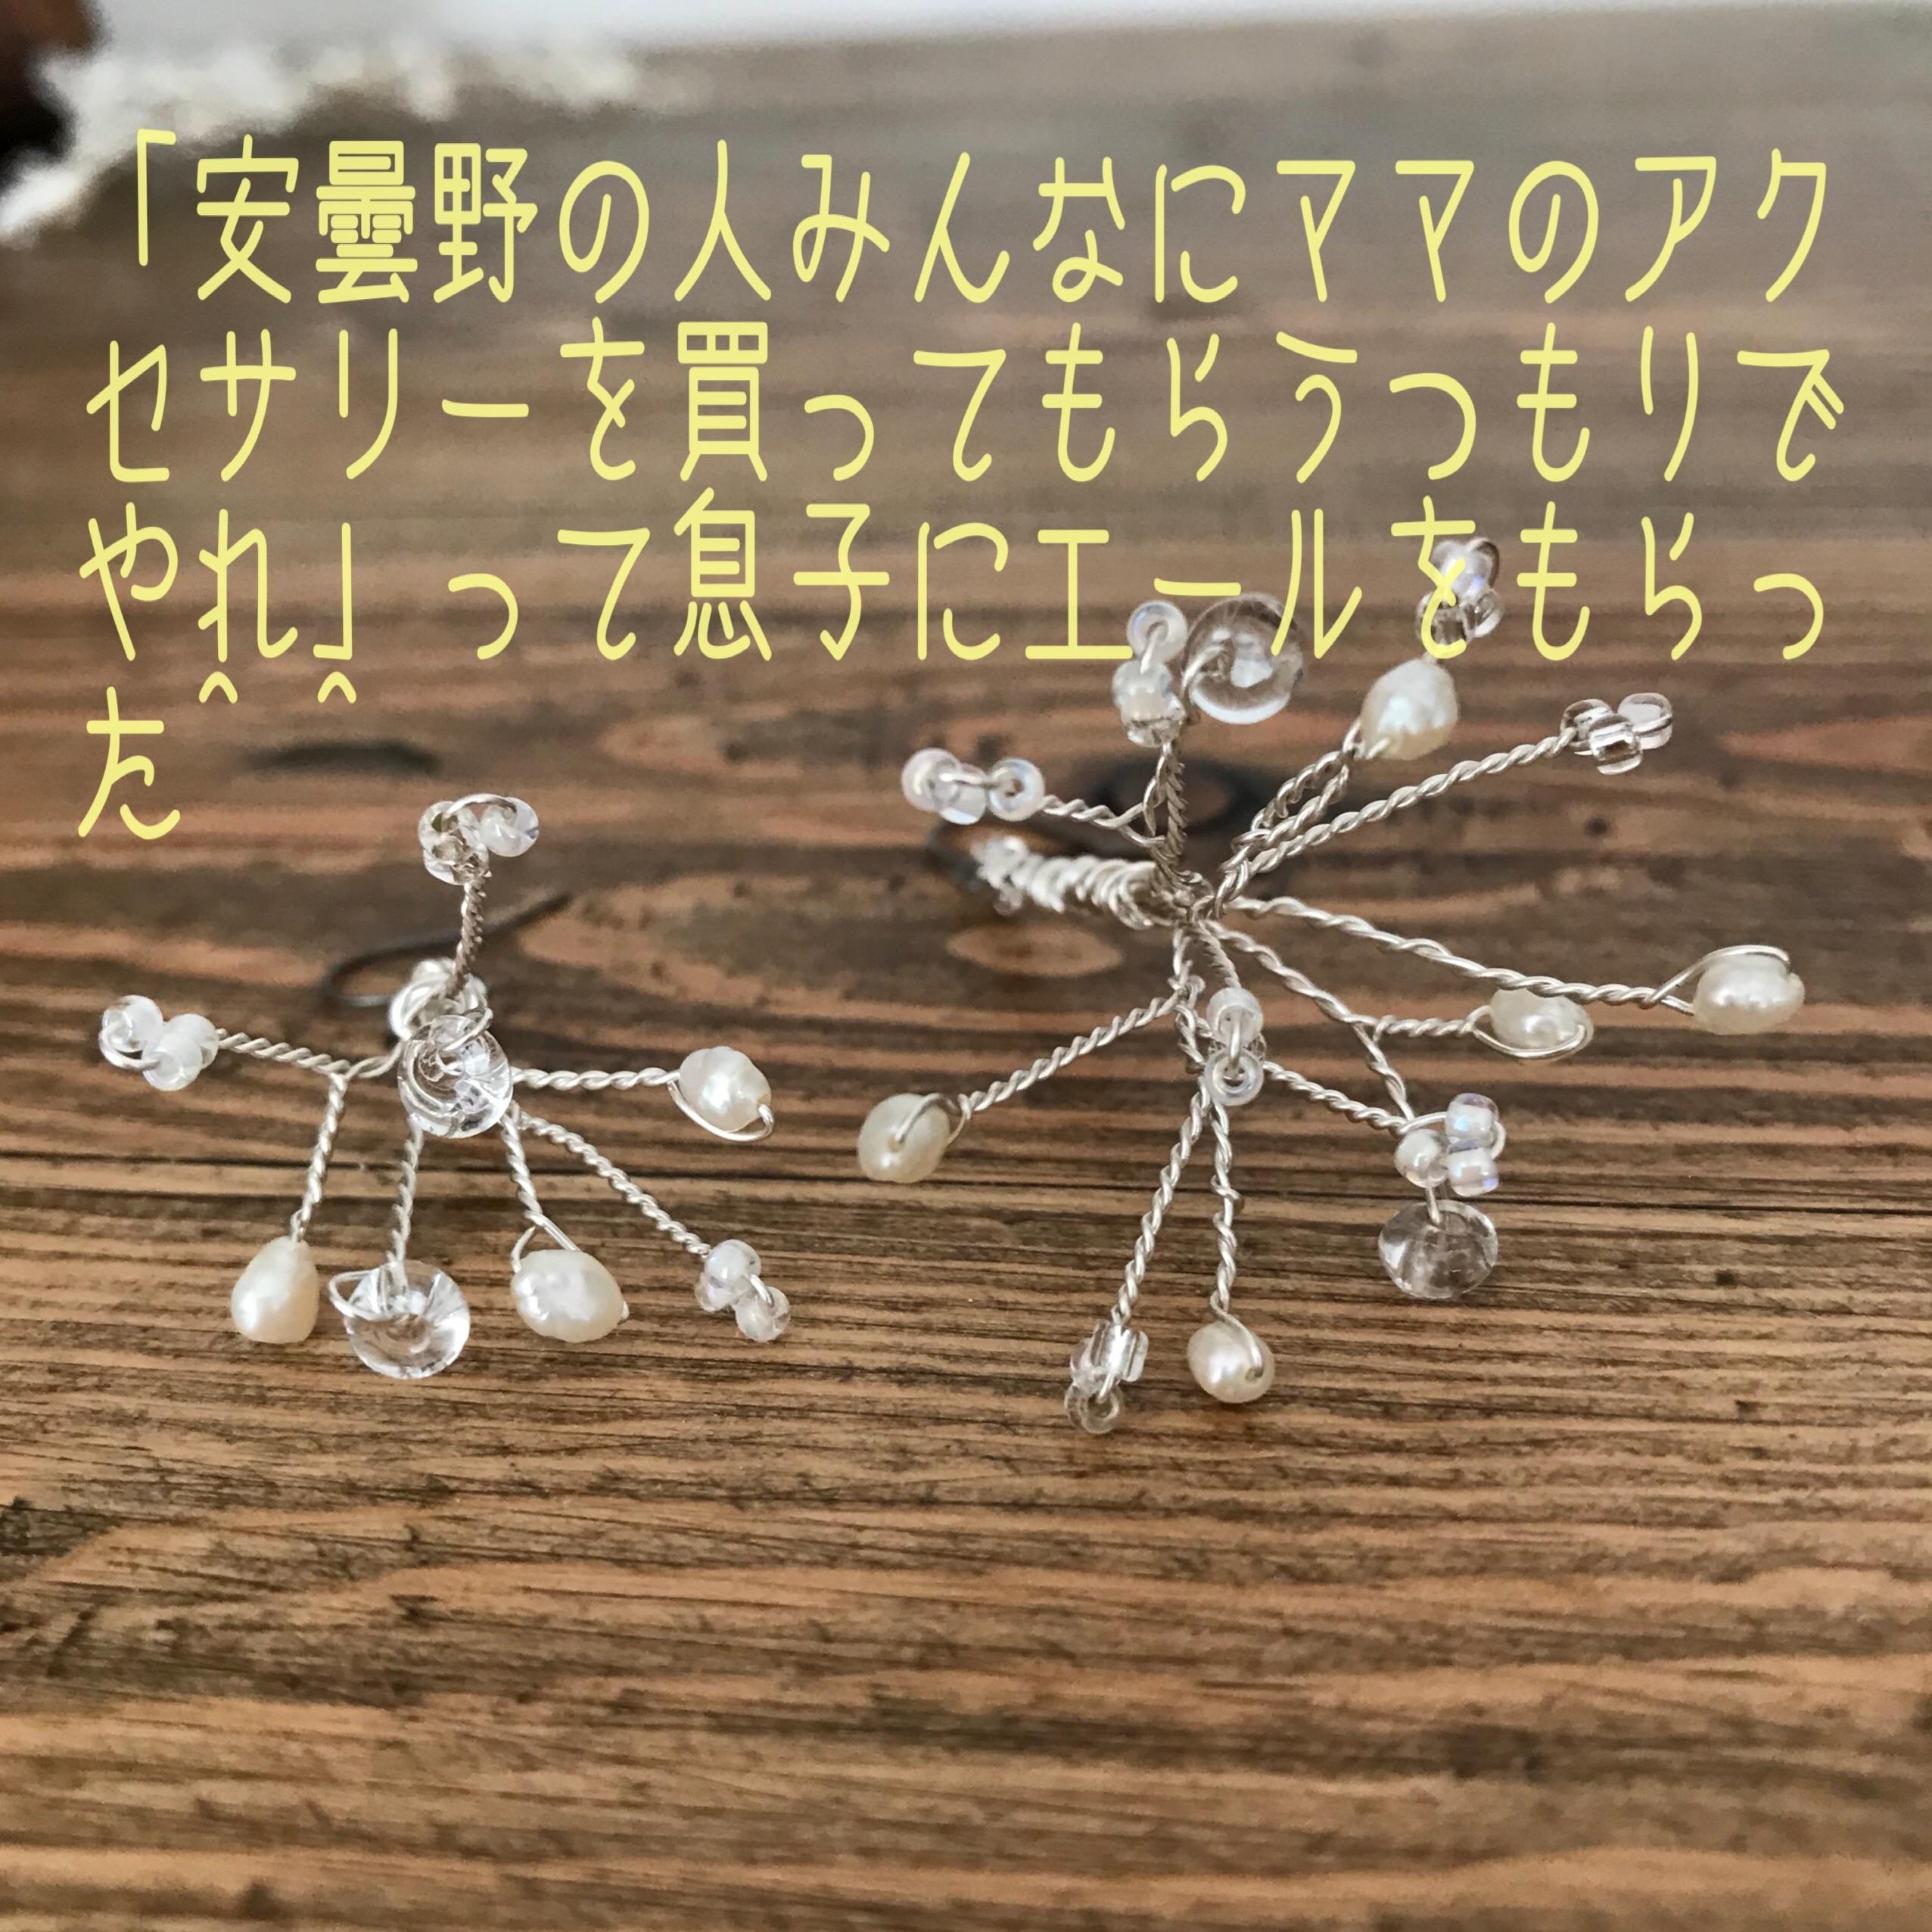 f:id:lovecrystalchildren:20181116194317j:image